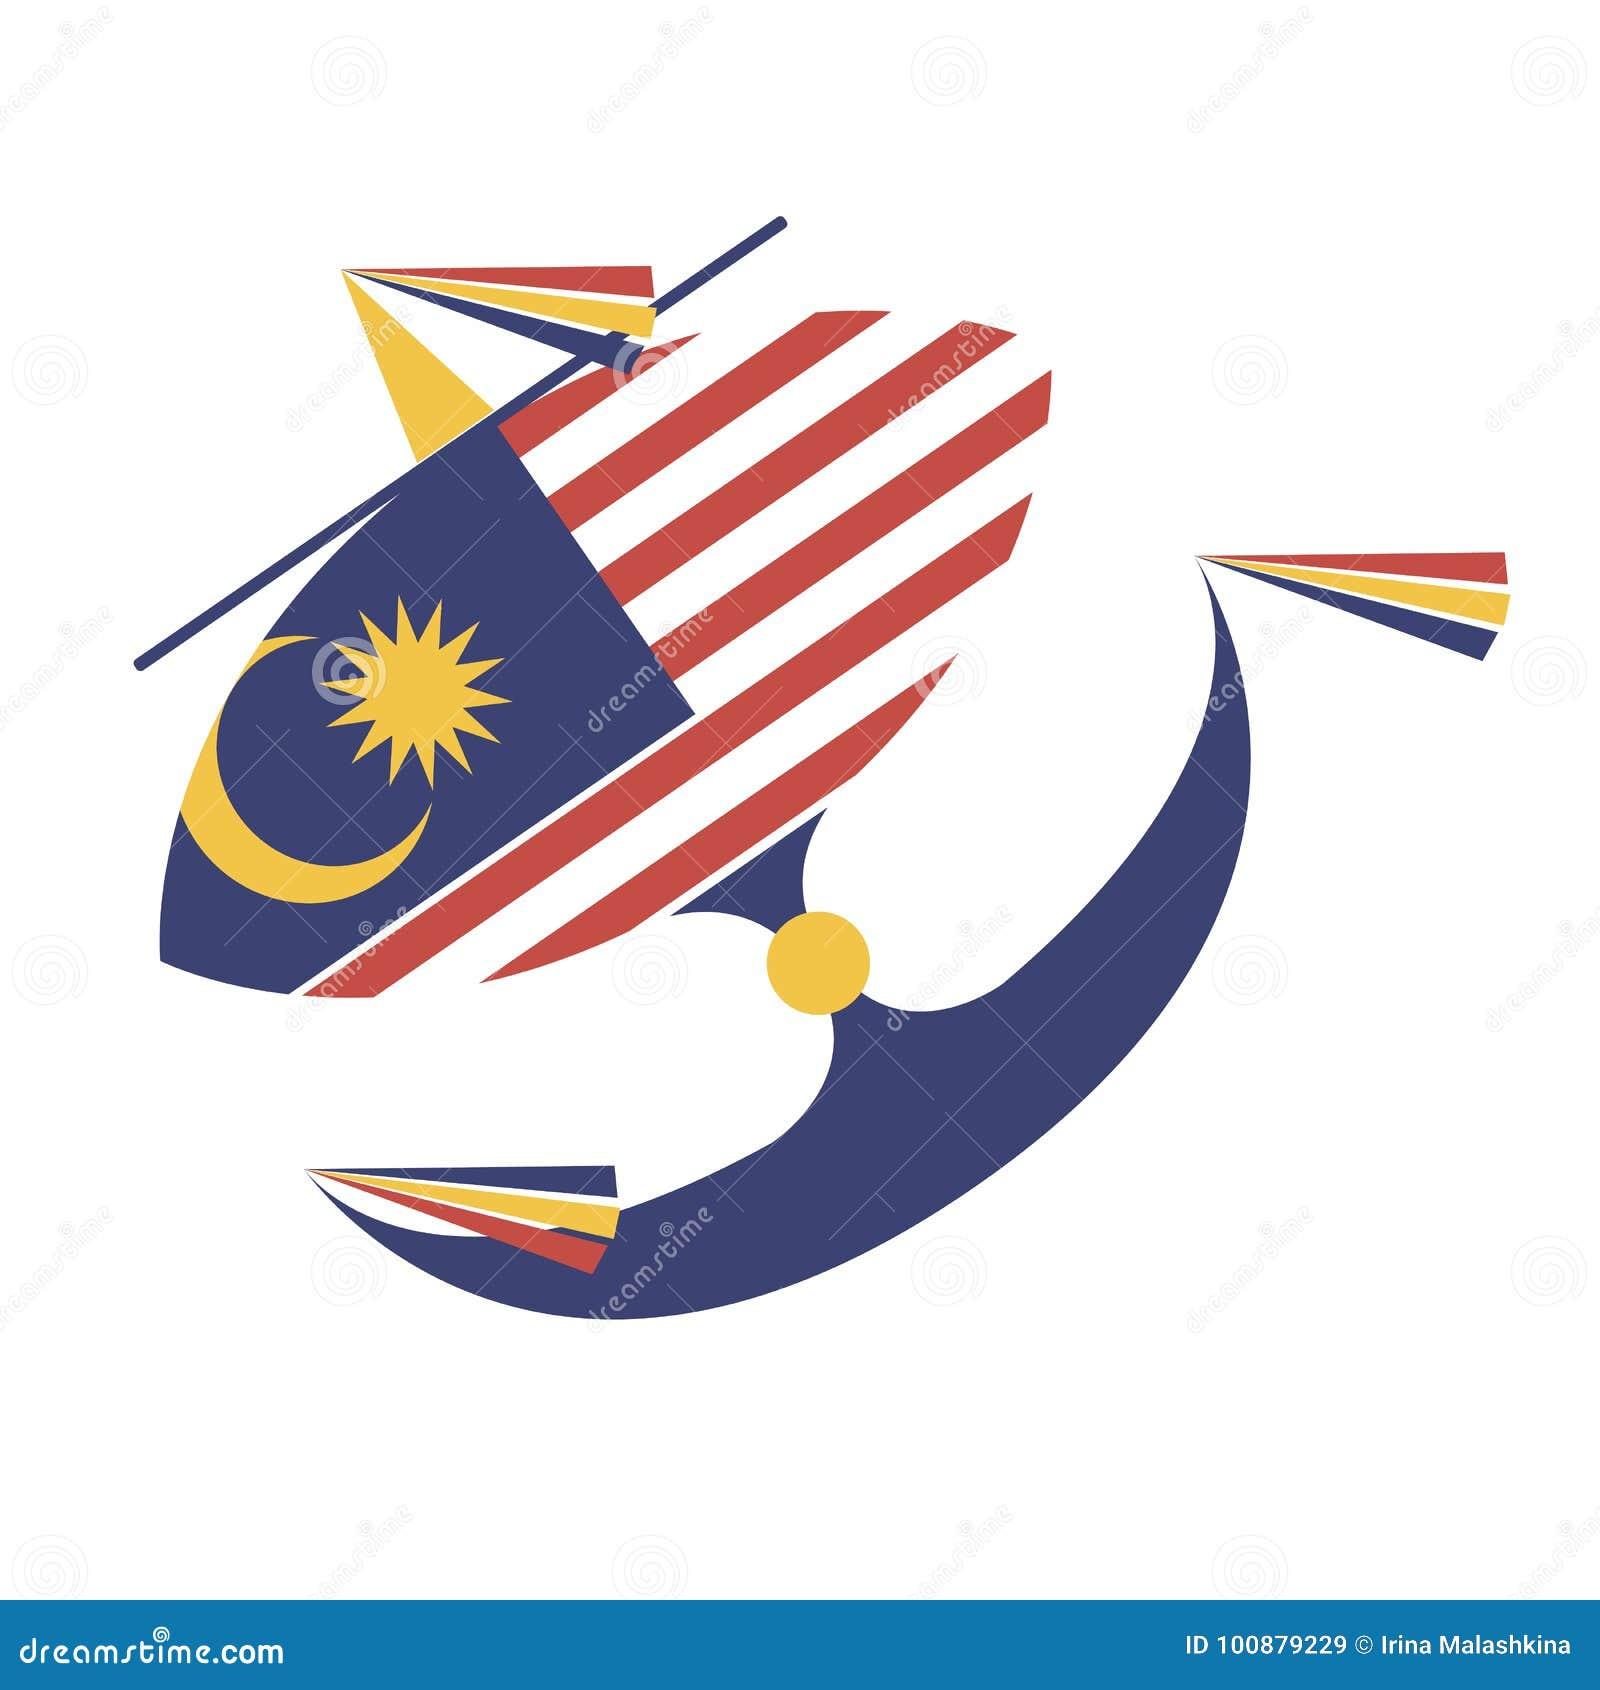 Wau bulan malaysian stock vector illustration of national 100879229 wau bulan malaysian biocorpaavc